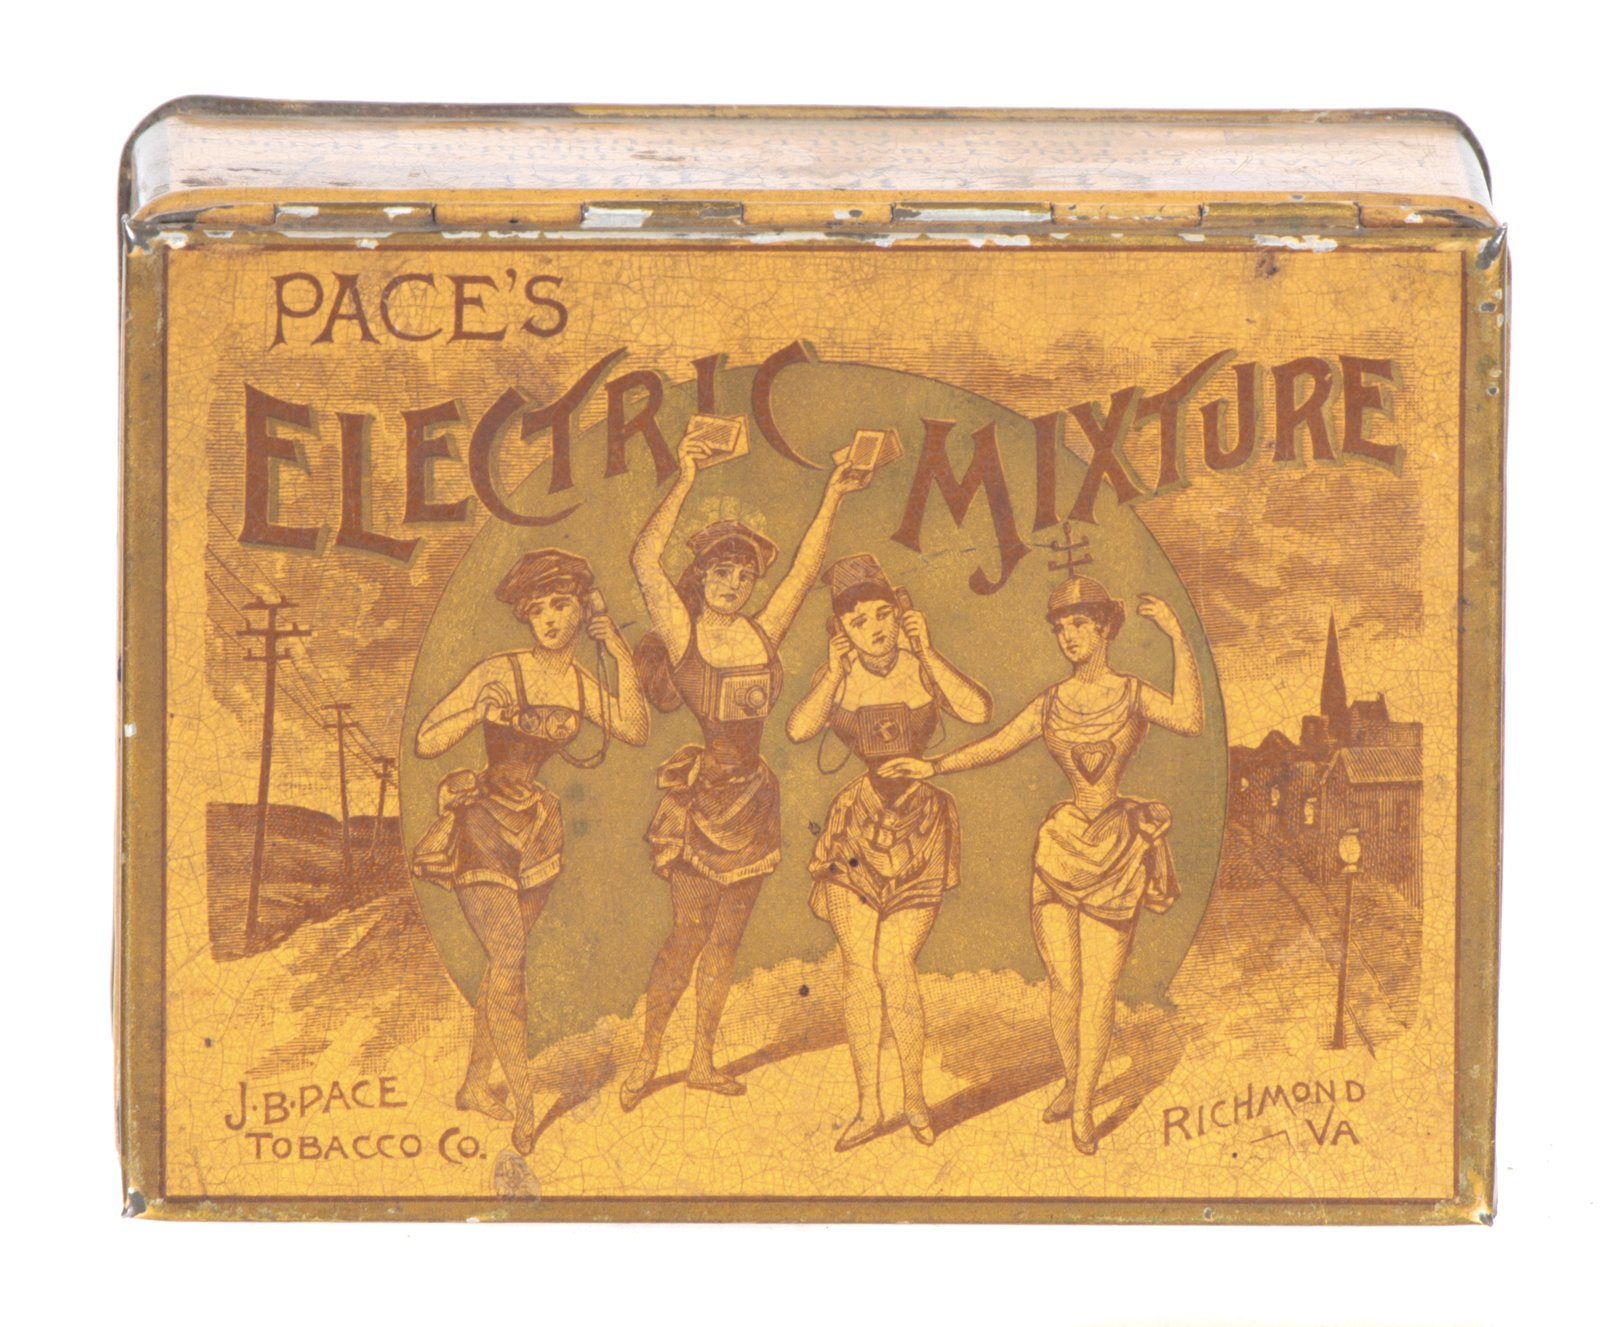 Electric Mixture Tobacco